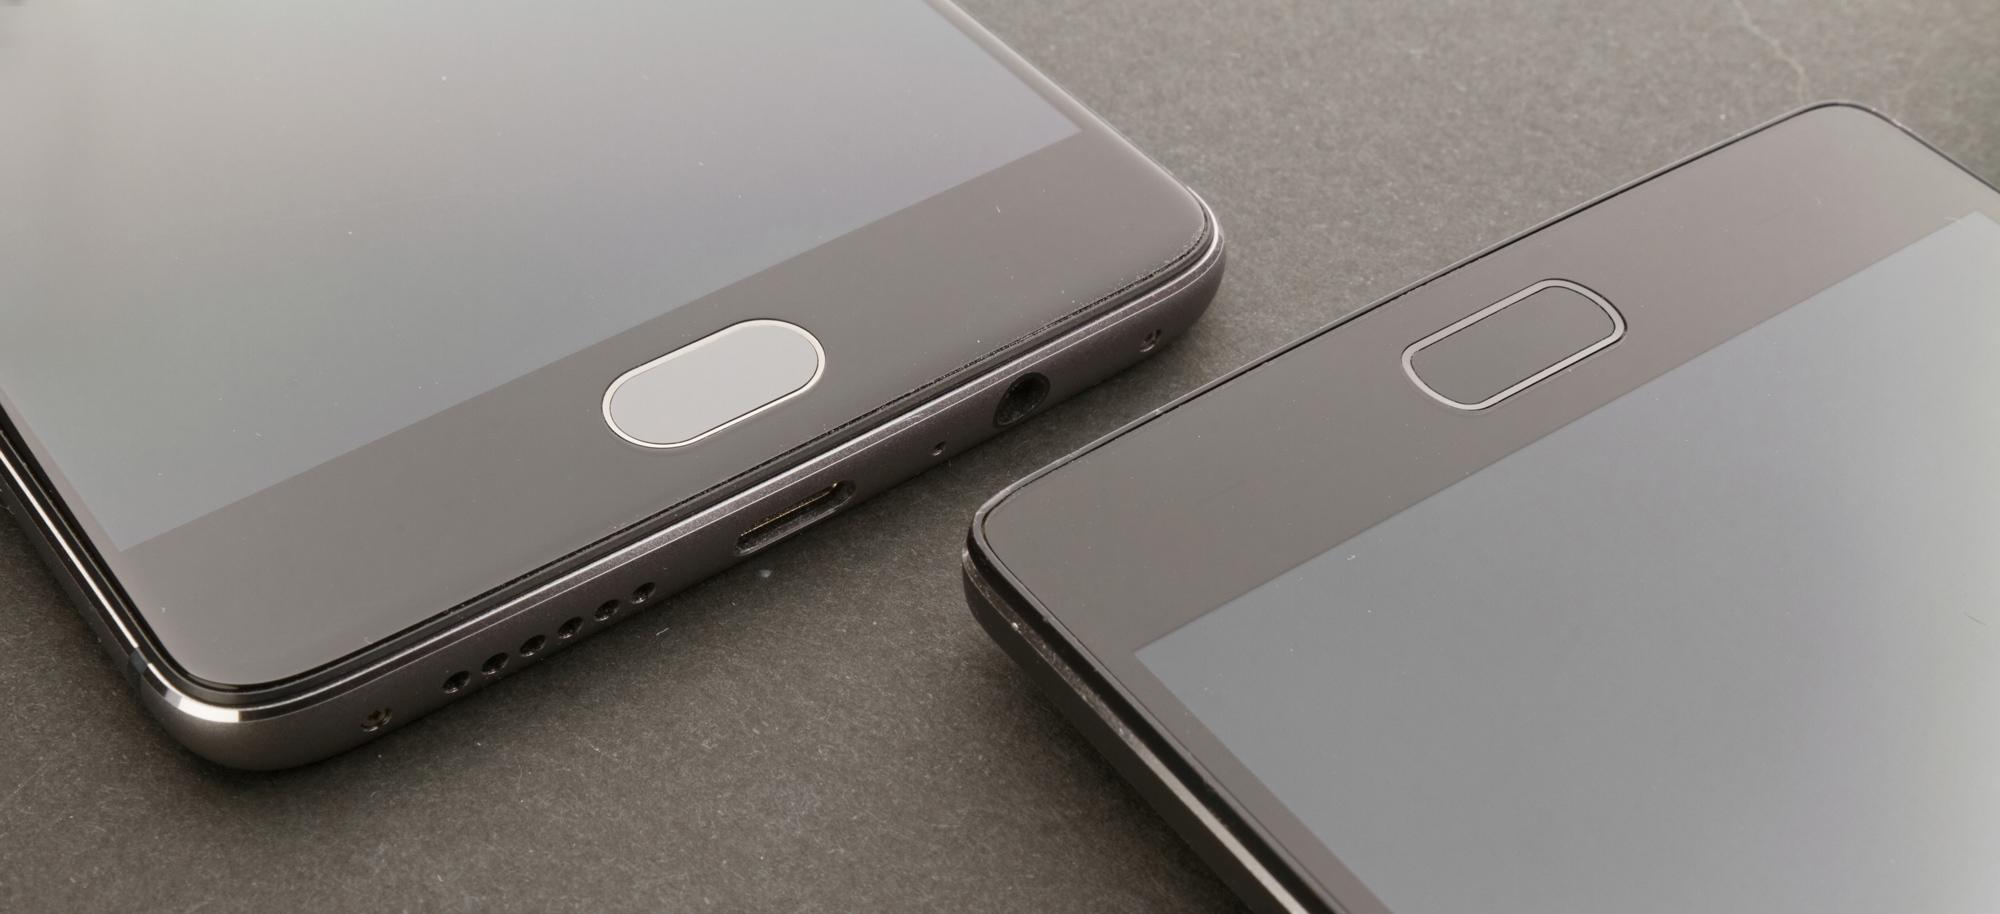 Foto de OnePlus 3 (5/11)